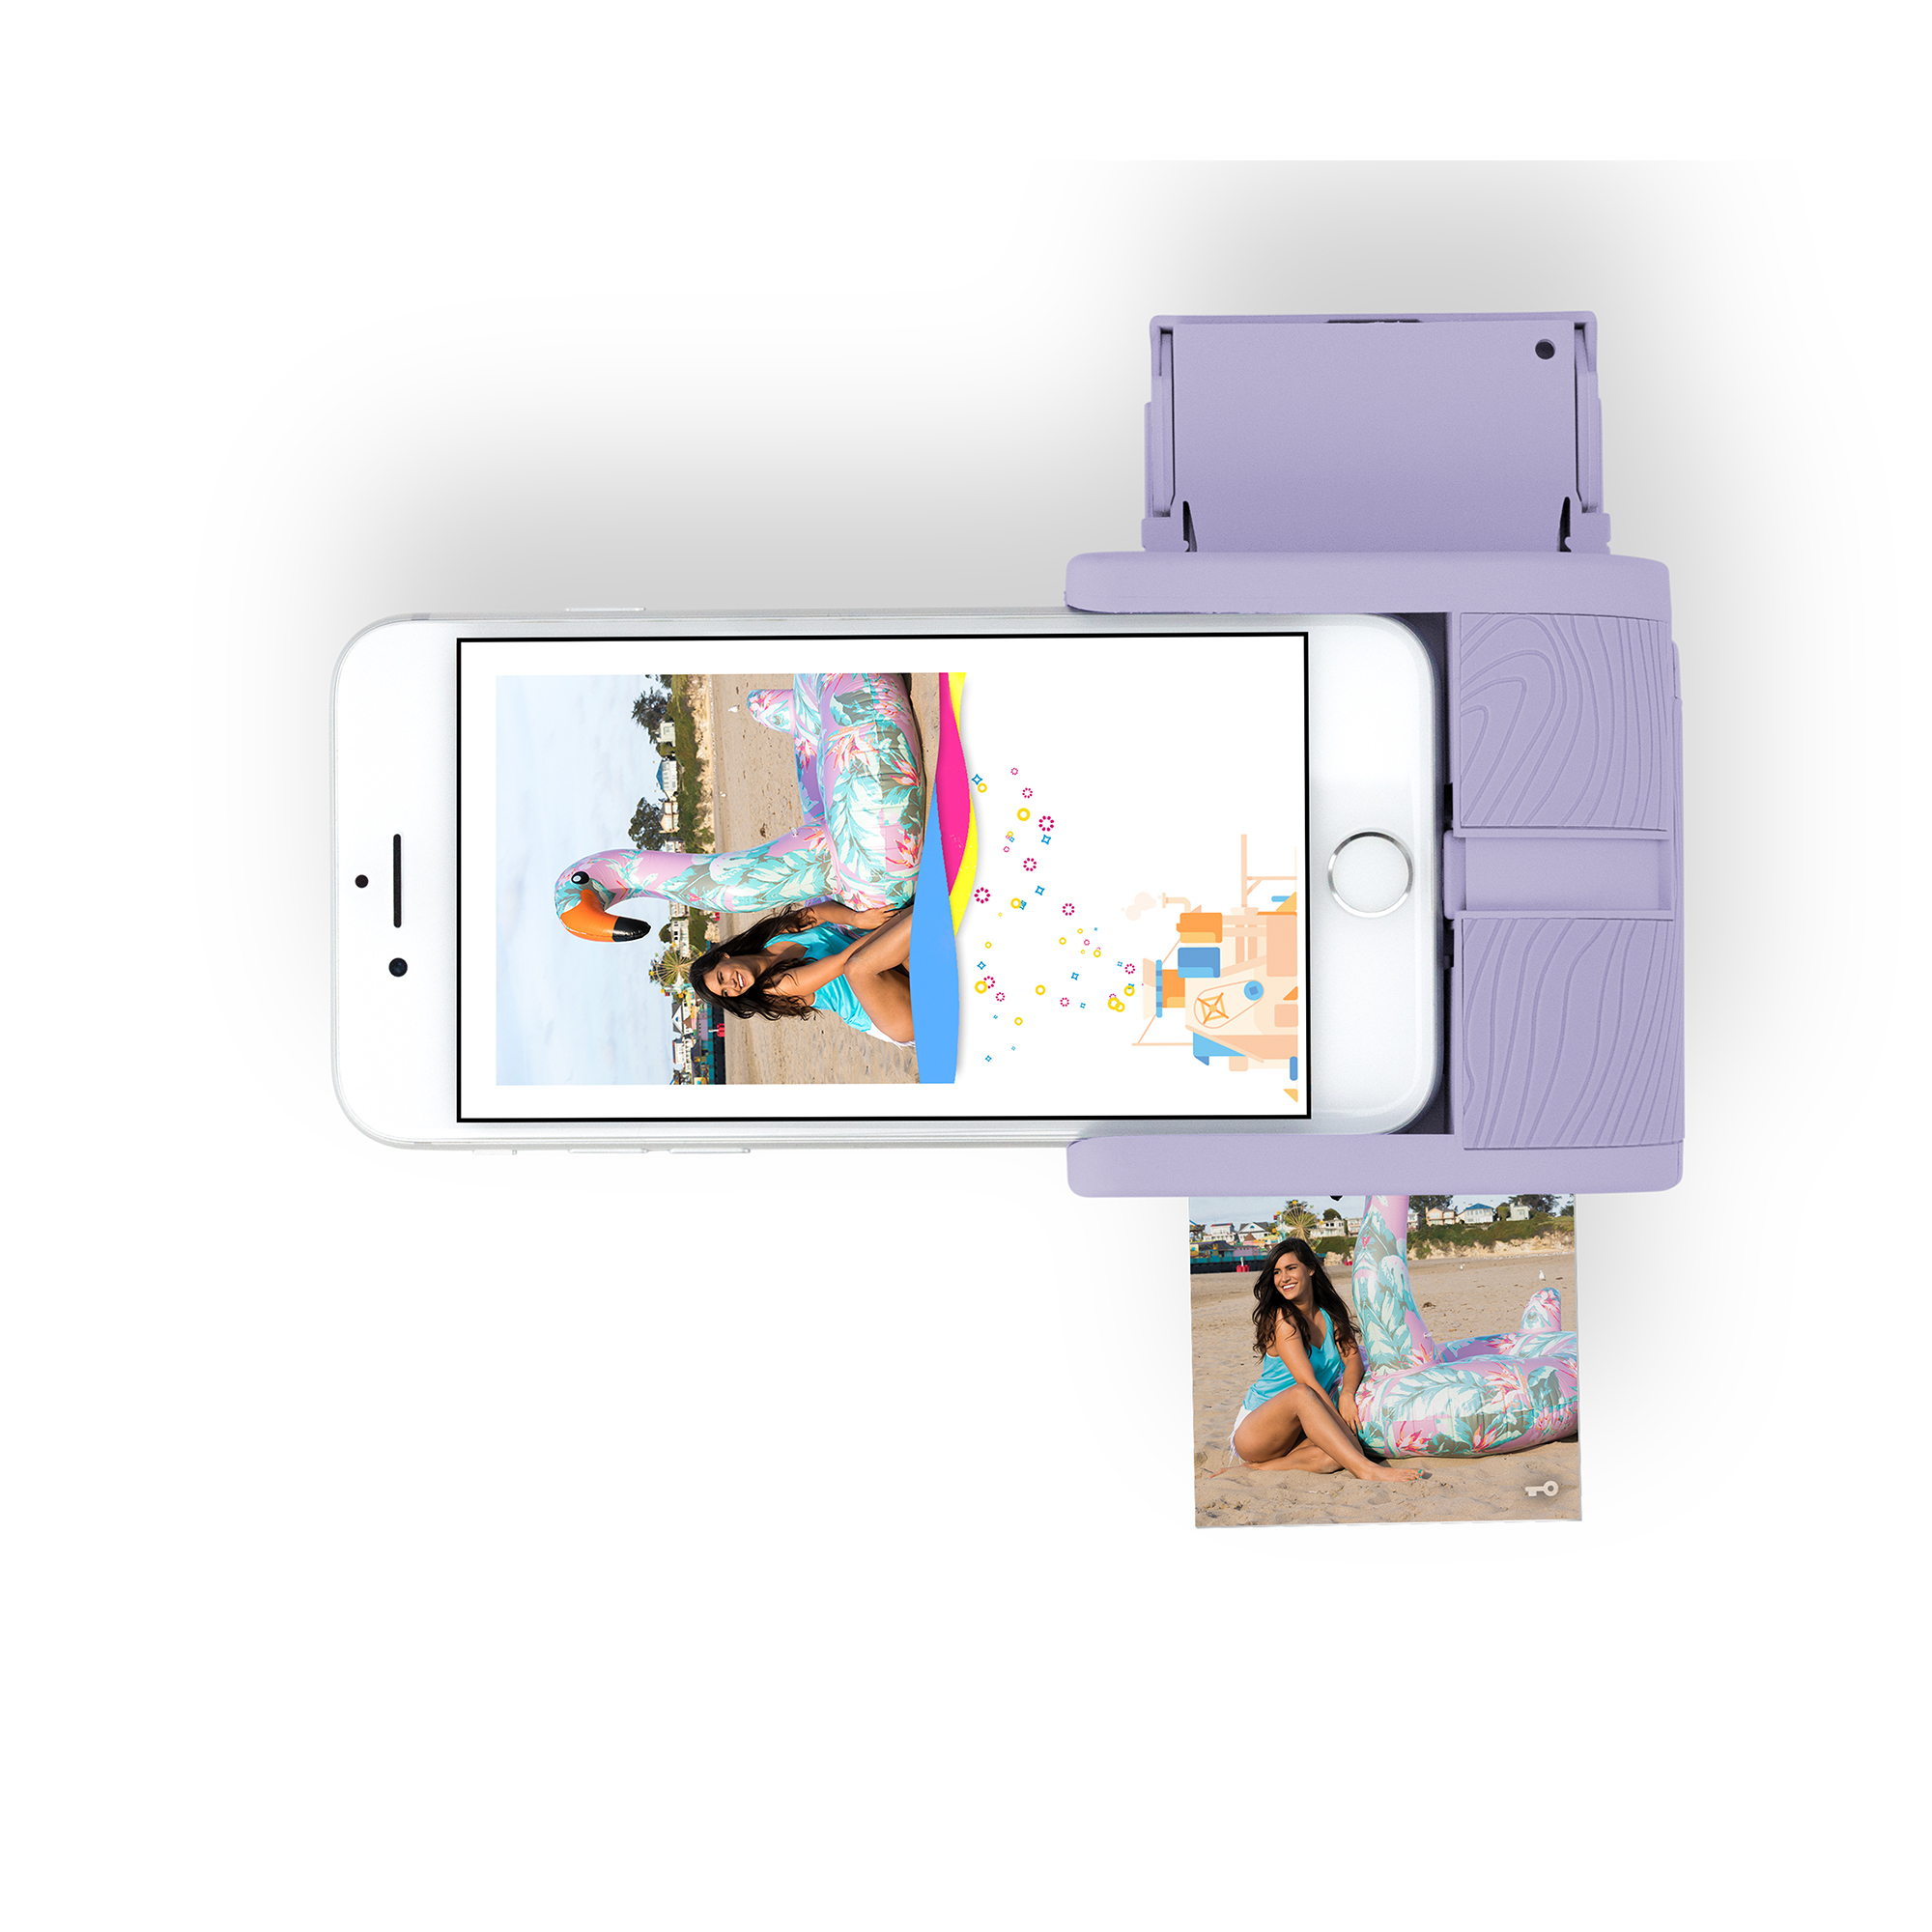 low priced 552e5 b80f4 Prynt Pocket iPhone Photo Printer - SmarTone Online Store